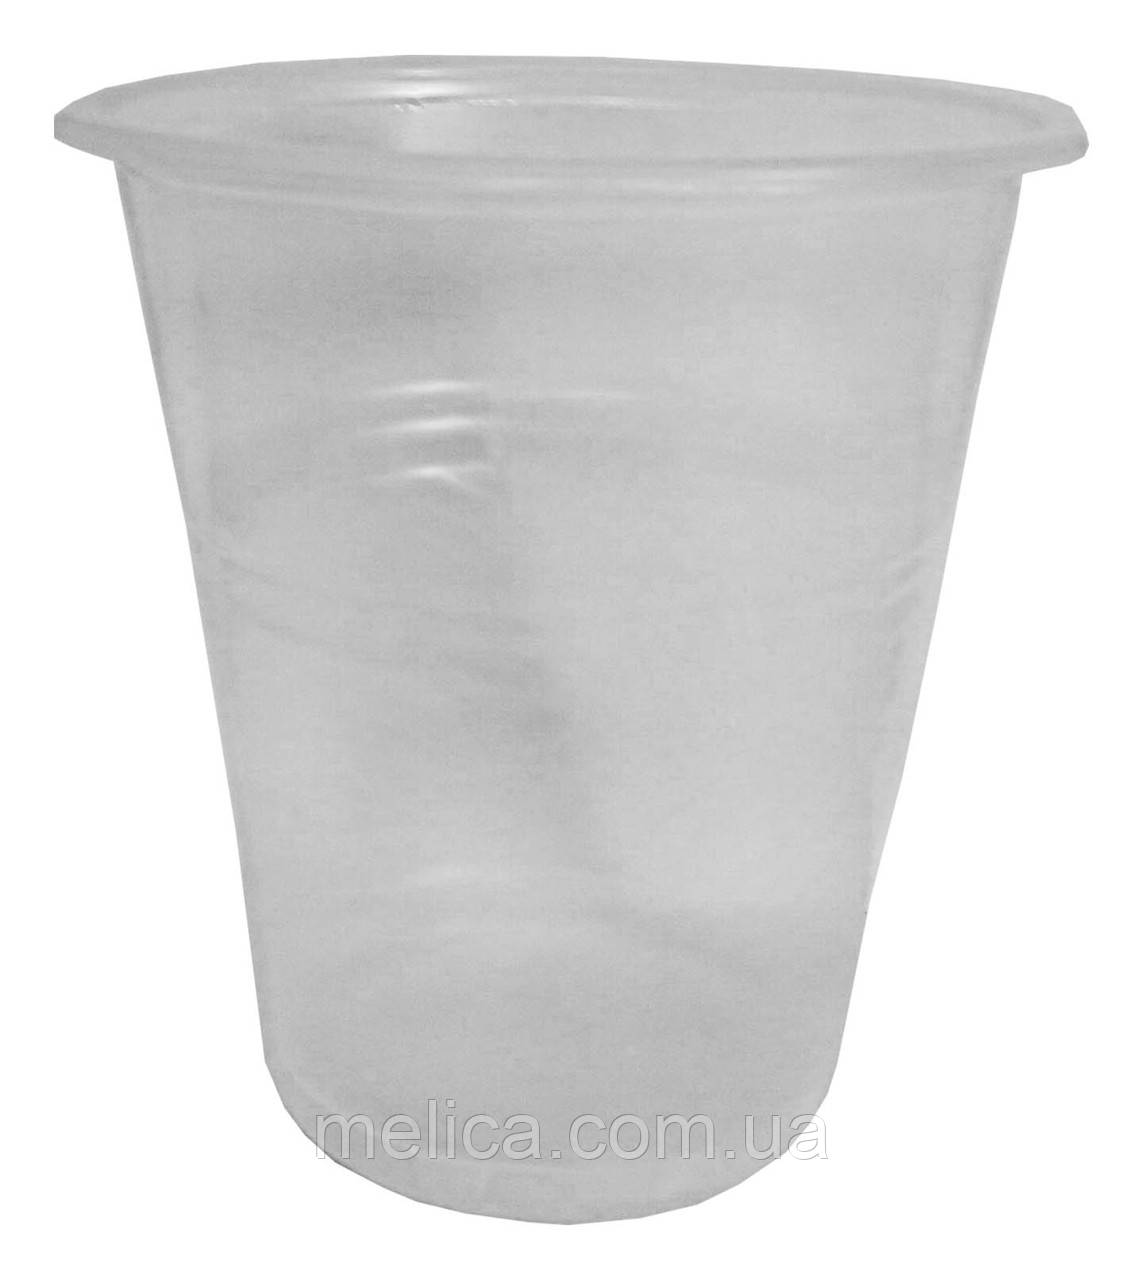 Стаканы пластиковые одноразовые PGU 180 мл - 100 шт.